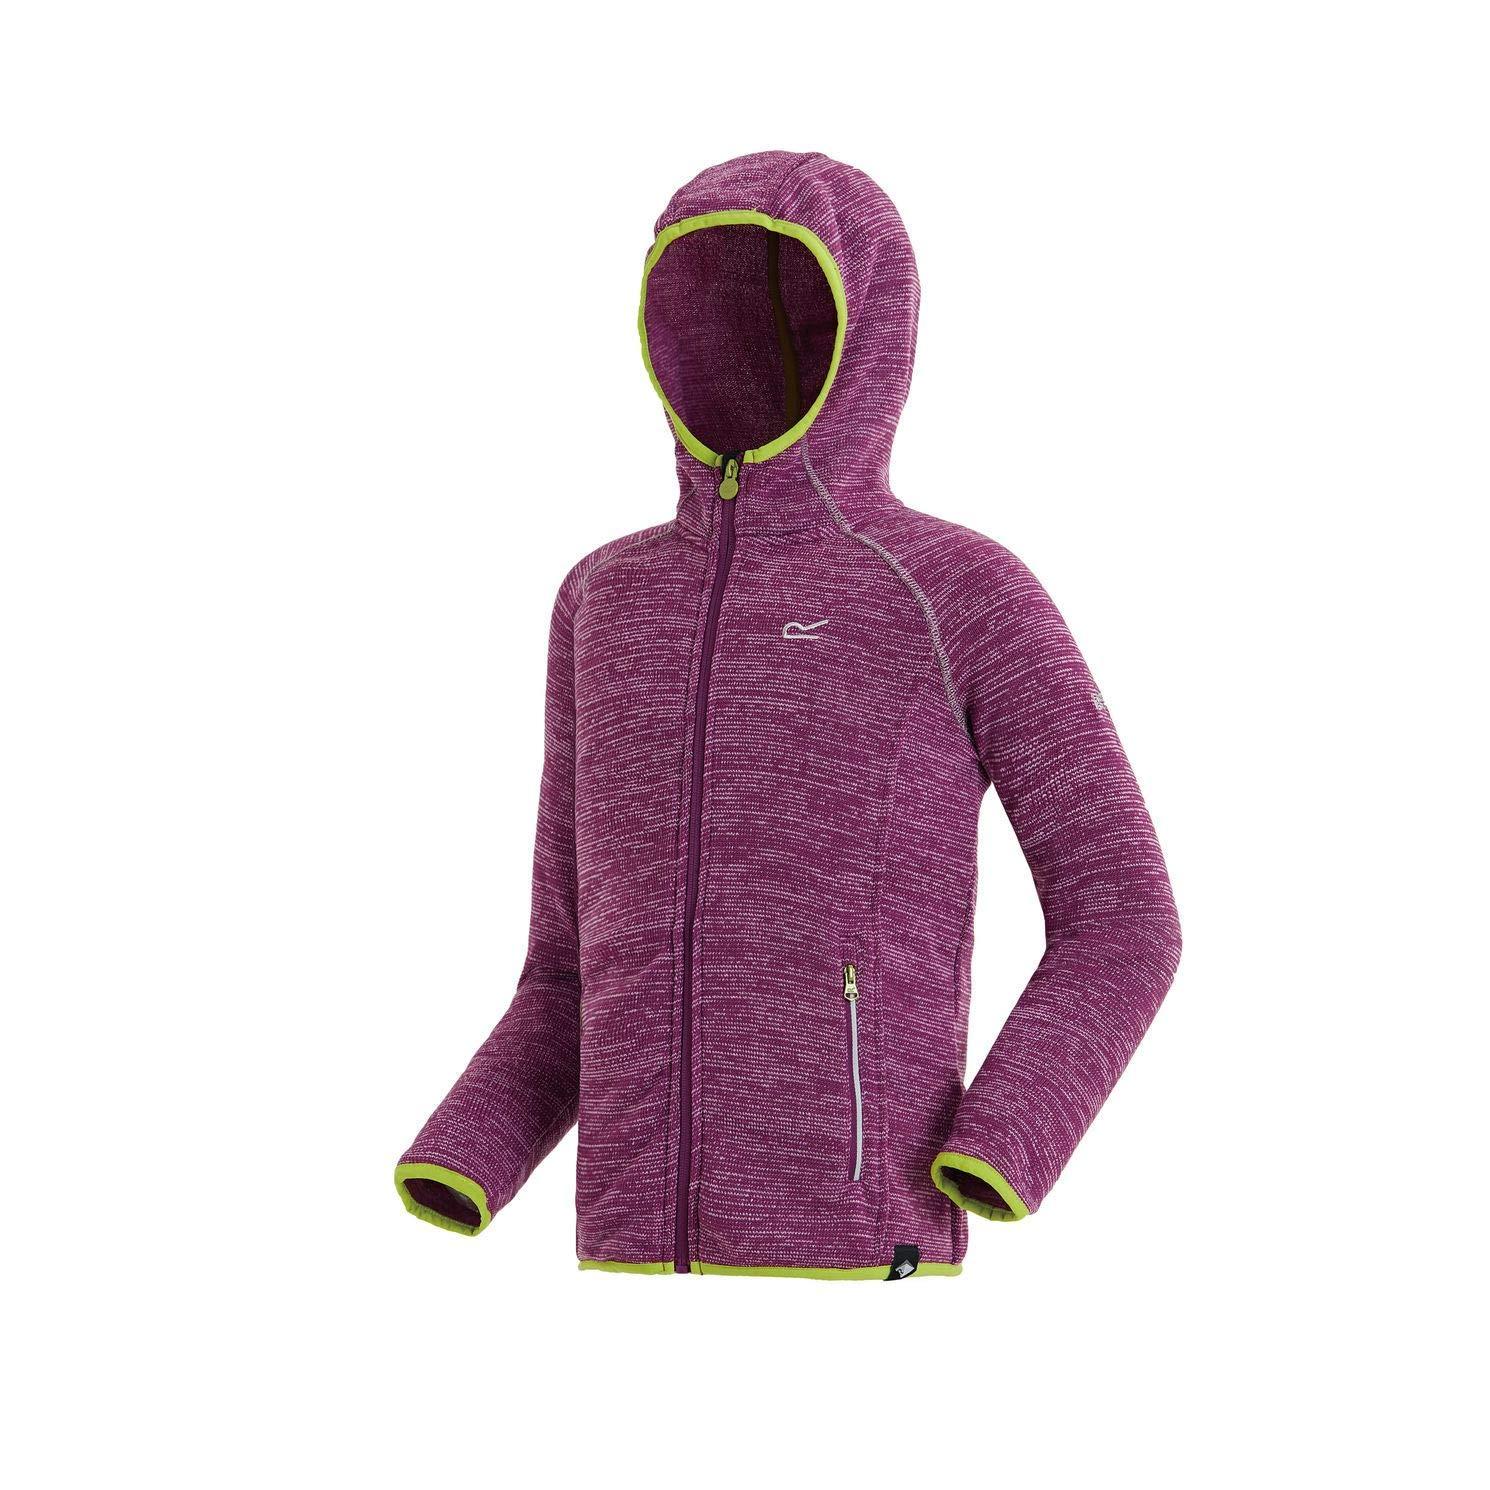 Regatta Childrens Dissolver Full-zip Stretch Hooded Fleece